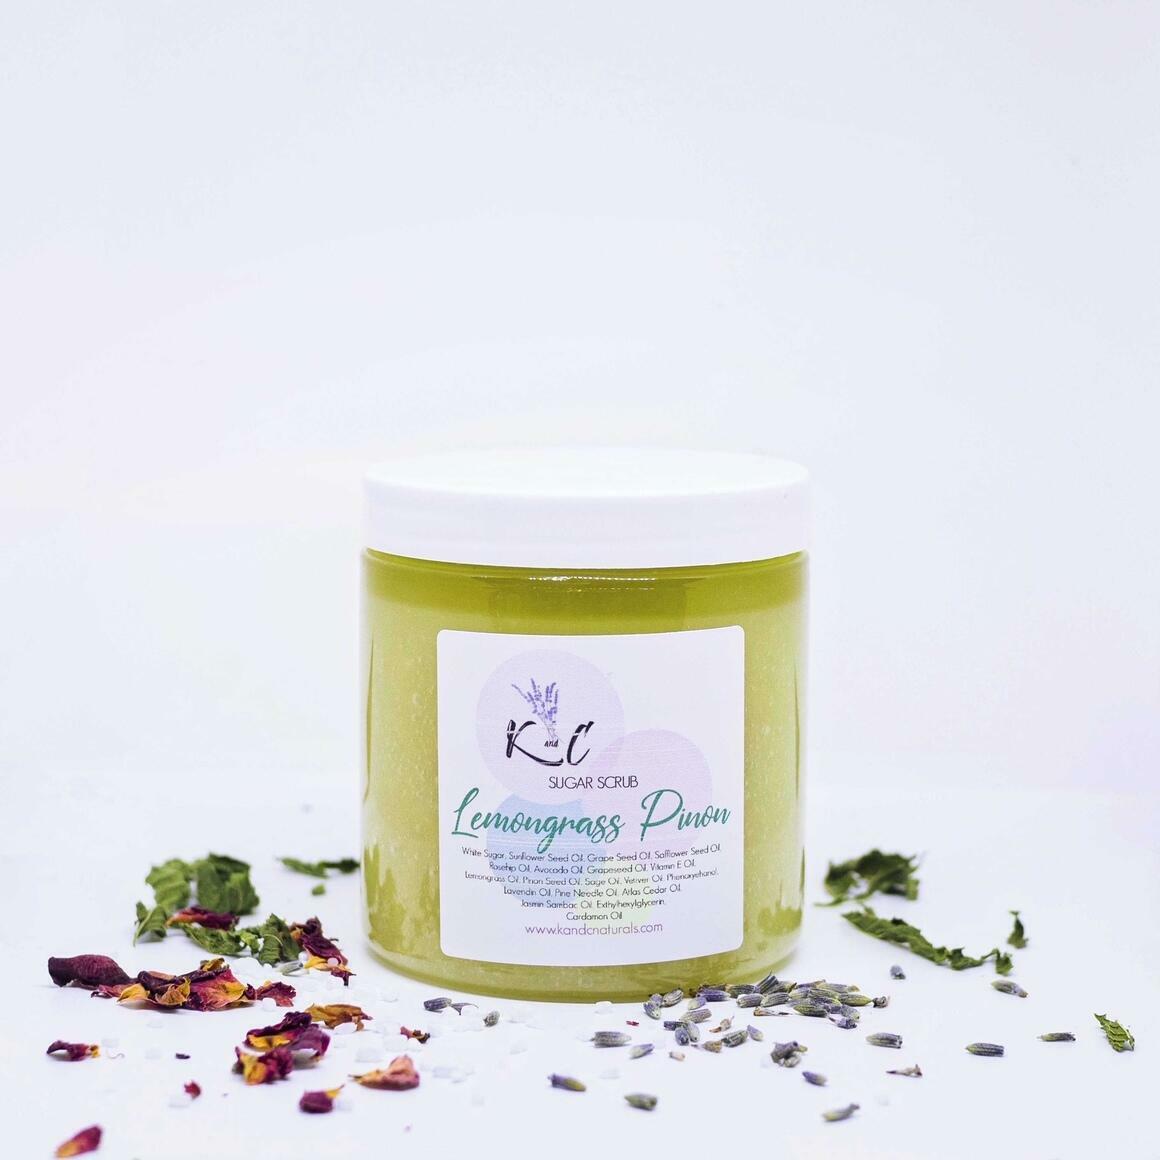 Lemongrass Pinon Sugar Scrub | Trada Marketplace